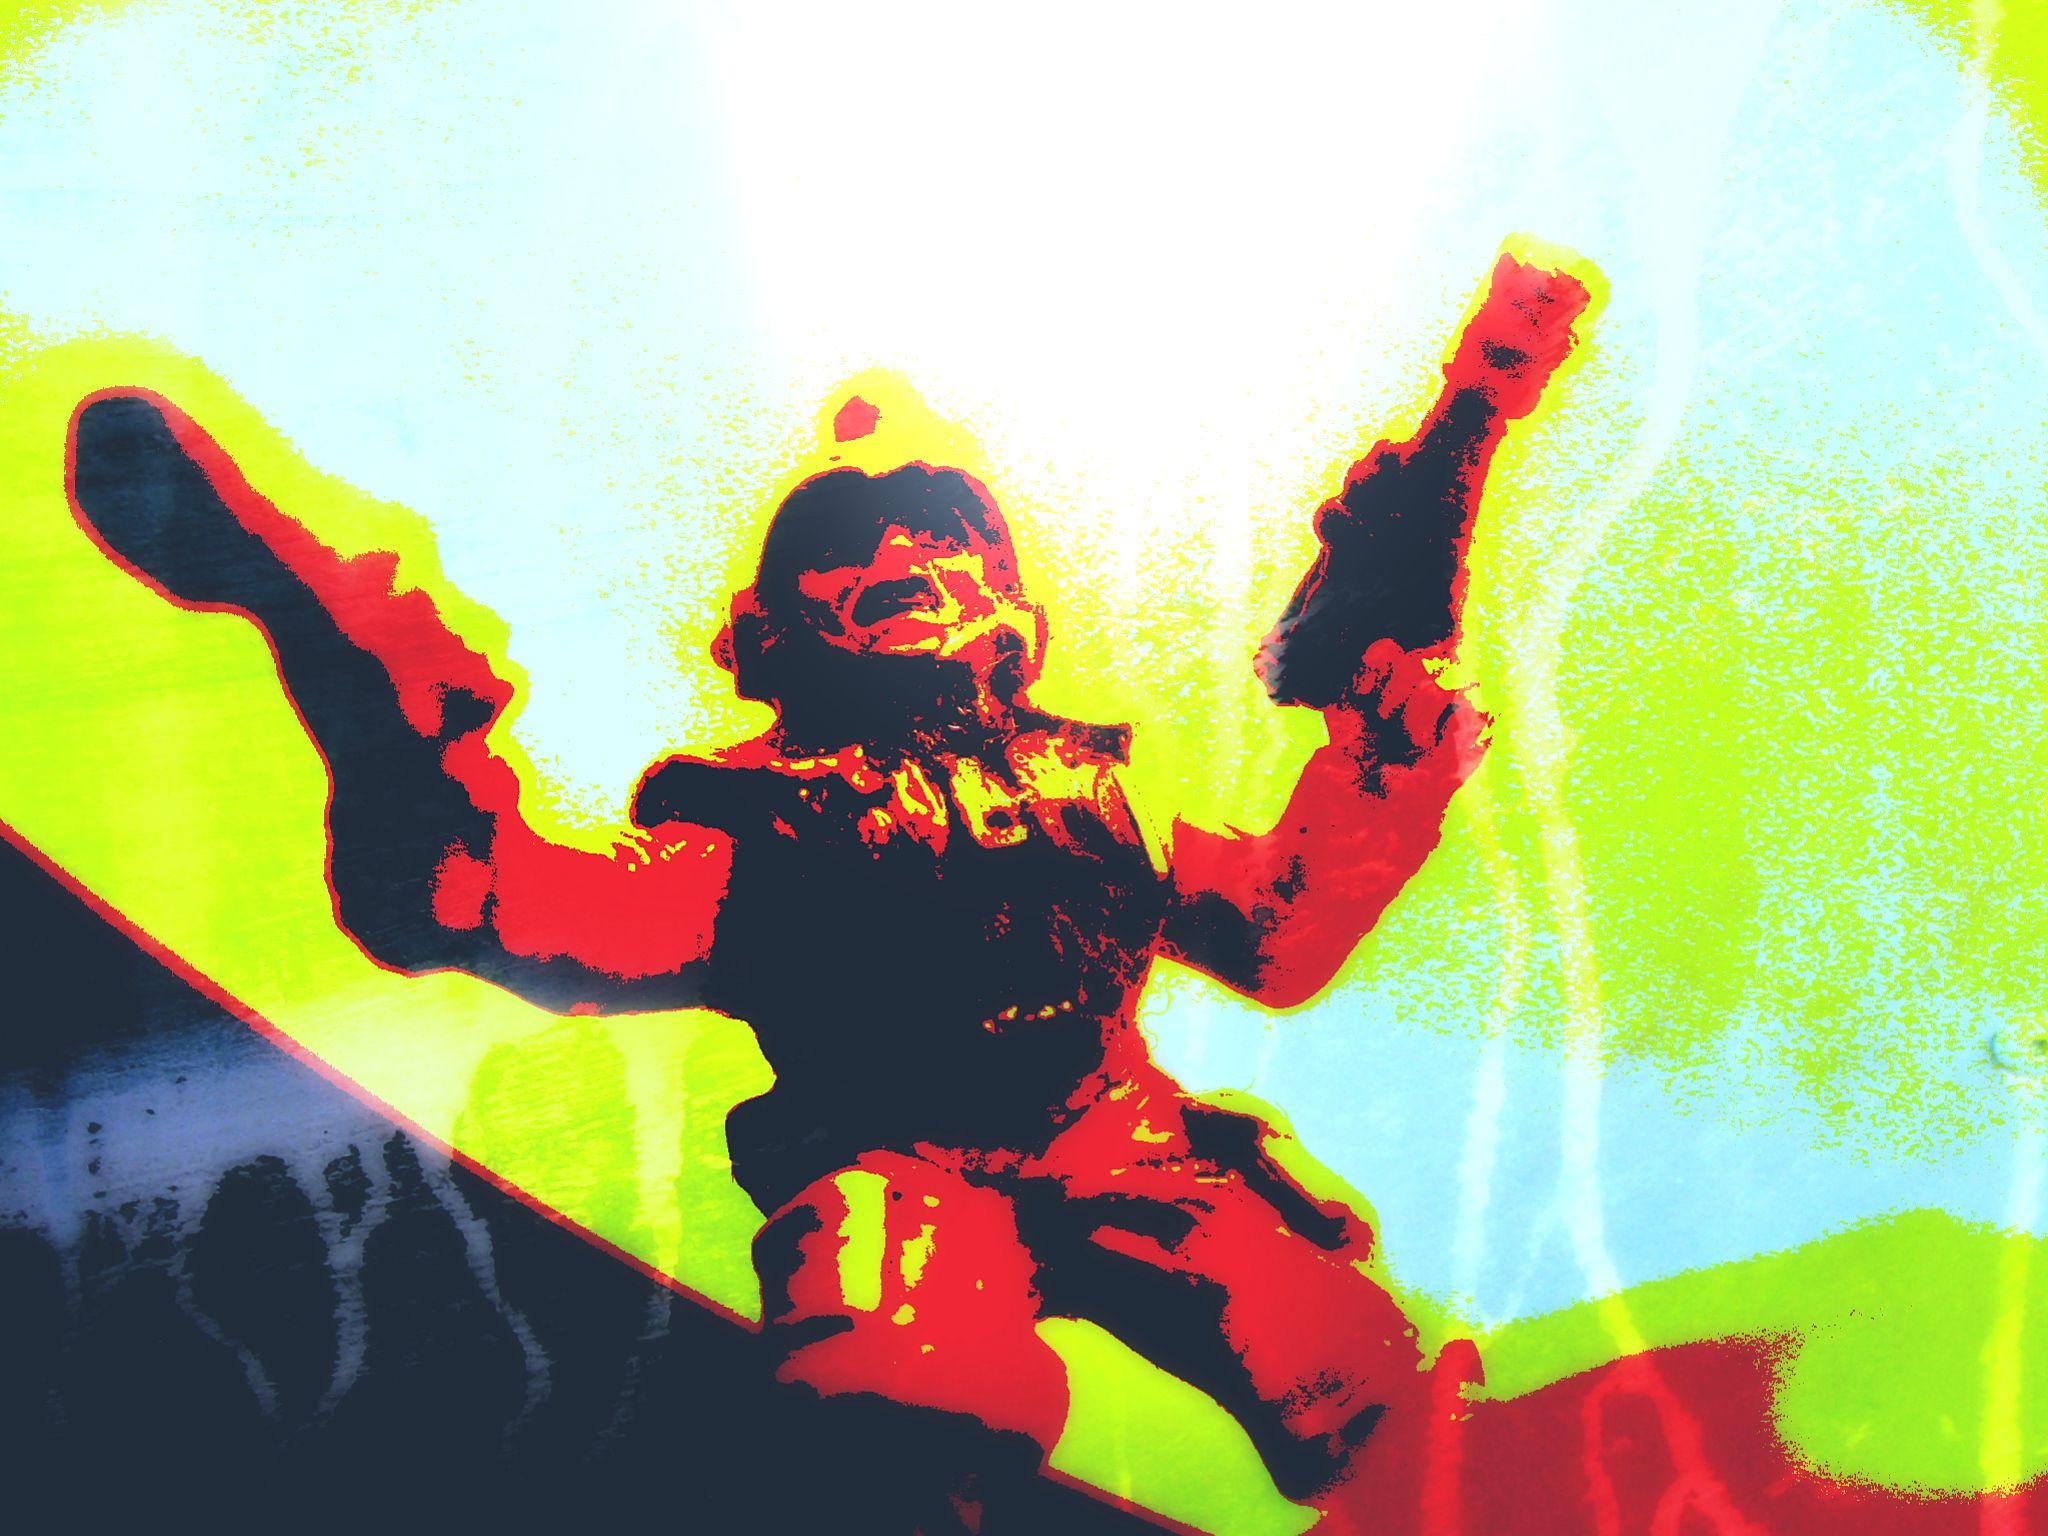 Imperial Guard Soldier - Rogue Trader days by MushroomBrain.deviantart.com on @deviantART